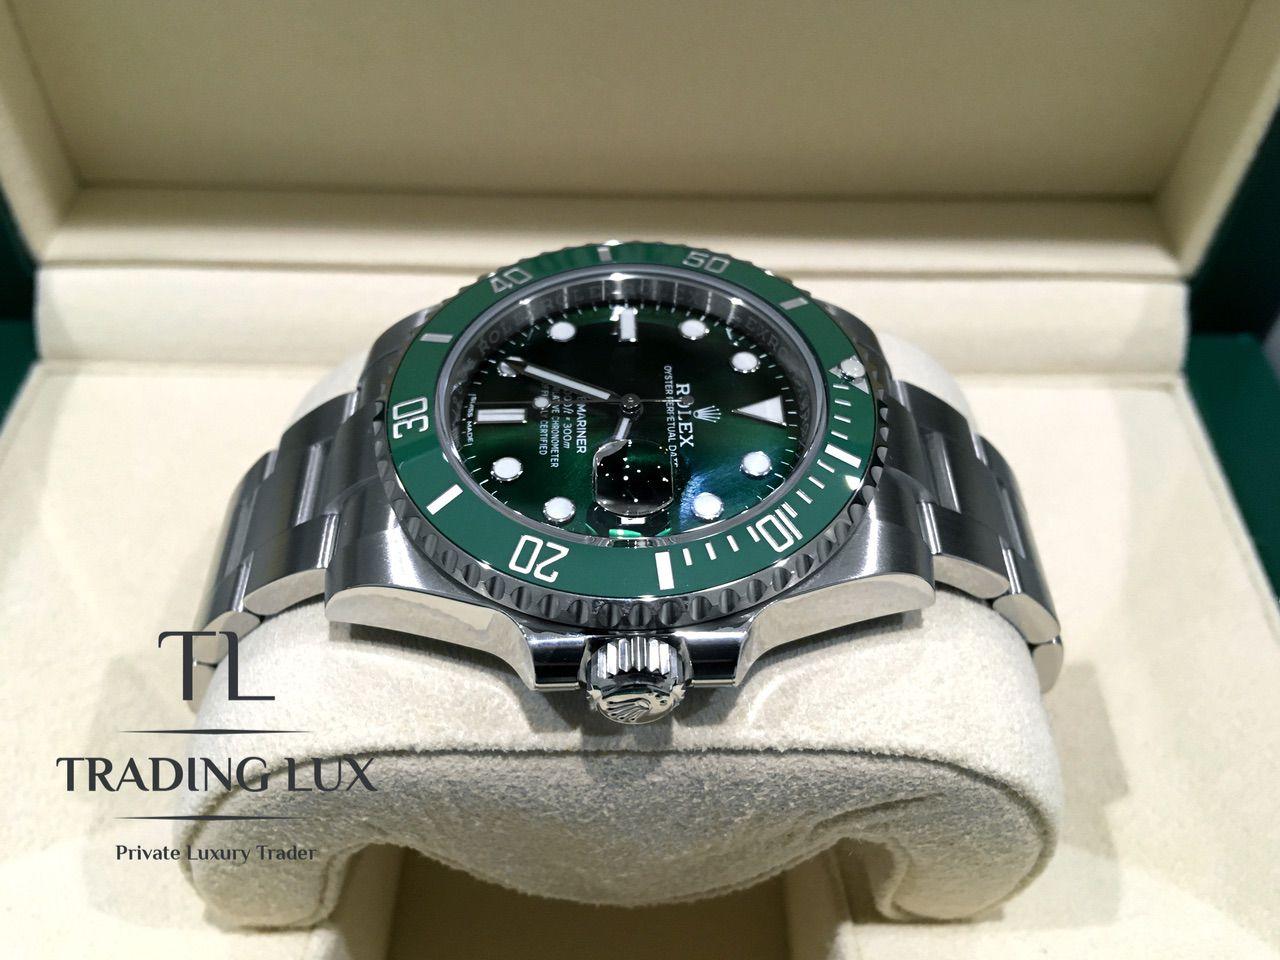 Rolex-116610LV-Hulk-1